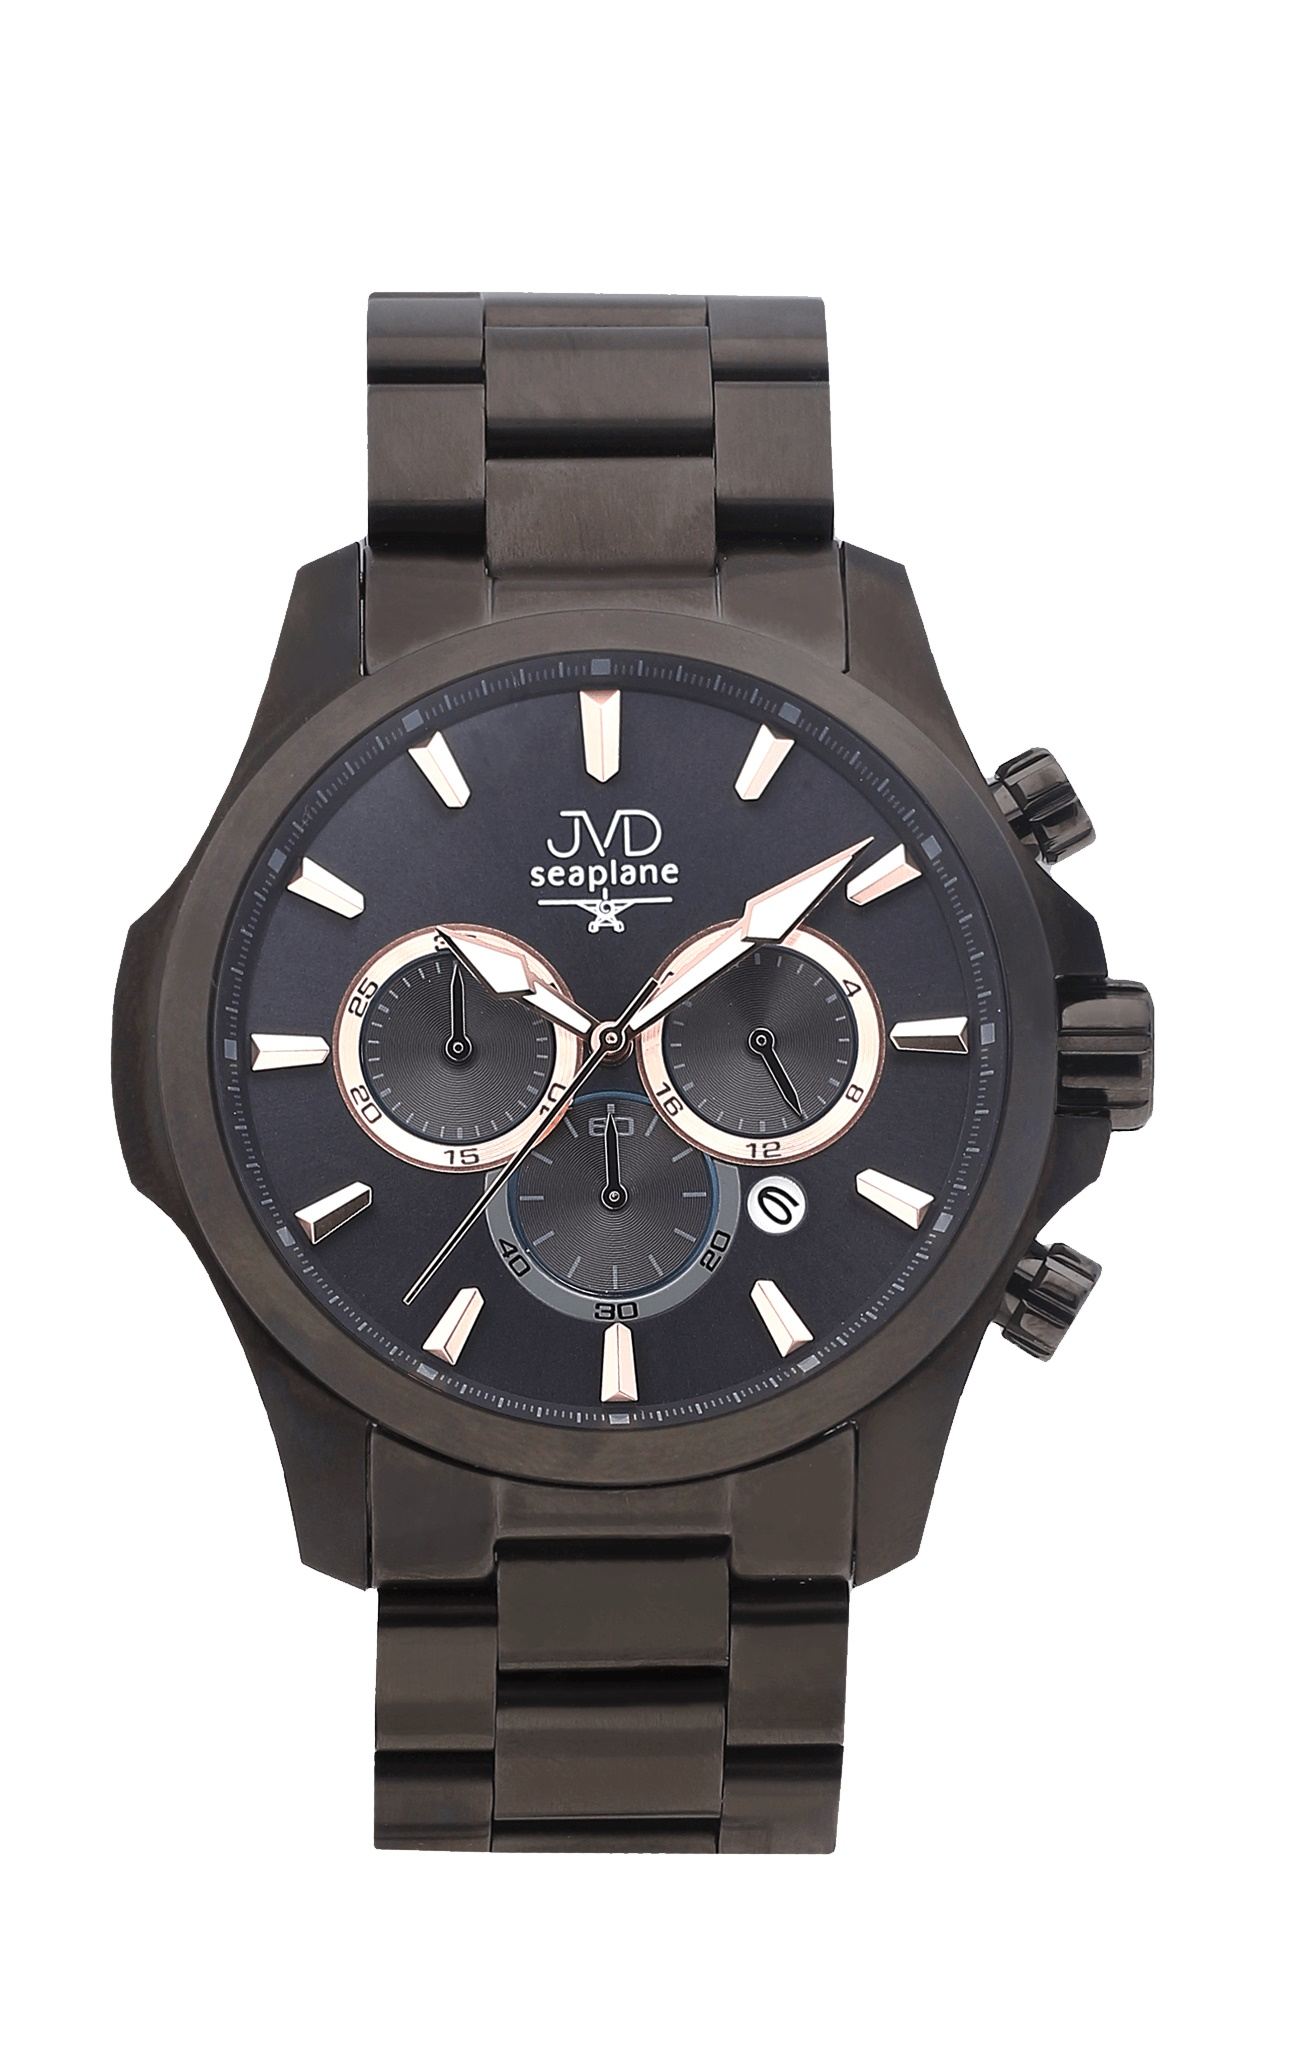 Vysoce odolné vodotěsné chronografy hodinky JVD Seaplane CORE JC704.2 - 10ATM (POŠTOVNÉ ZDARMA!!)